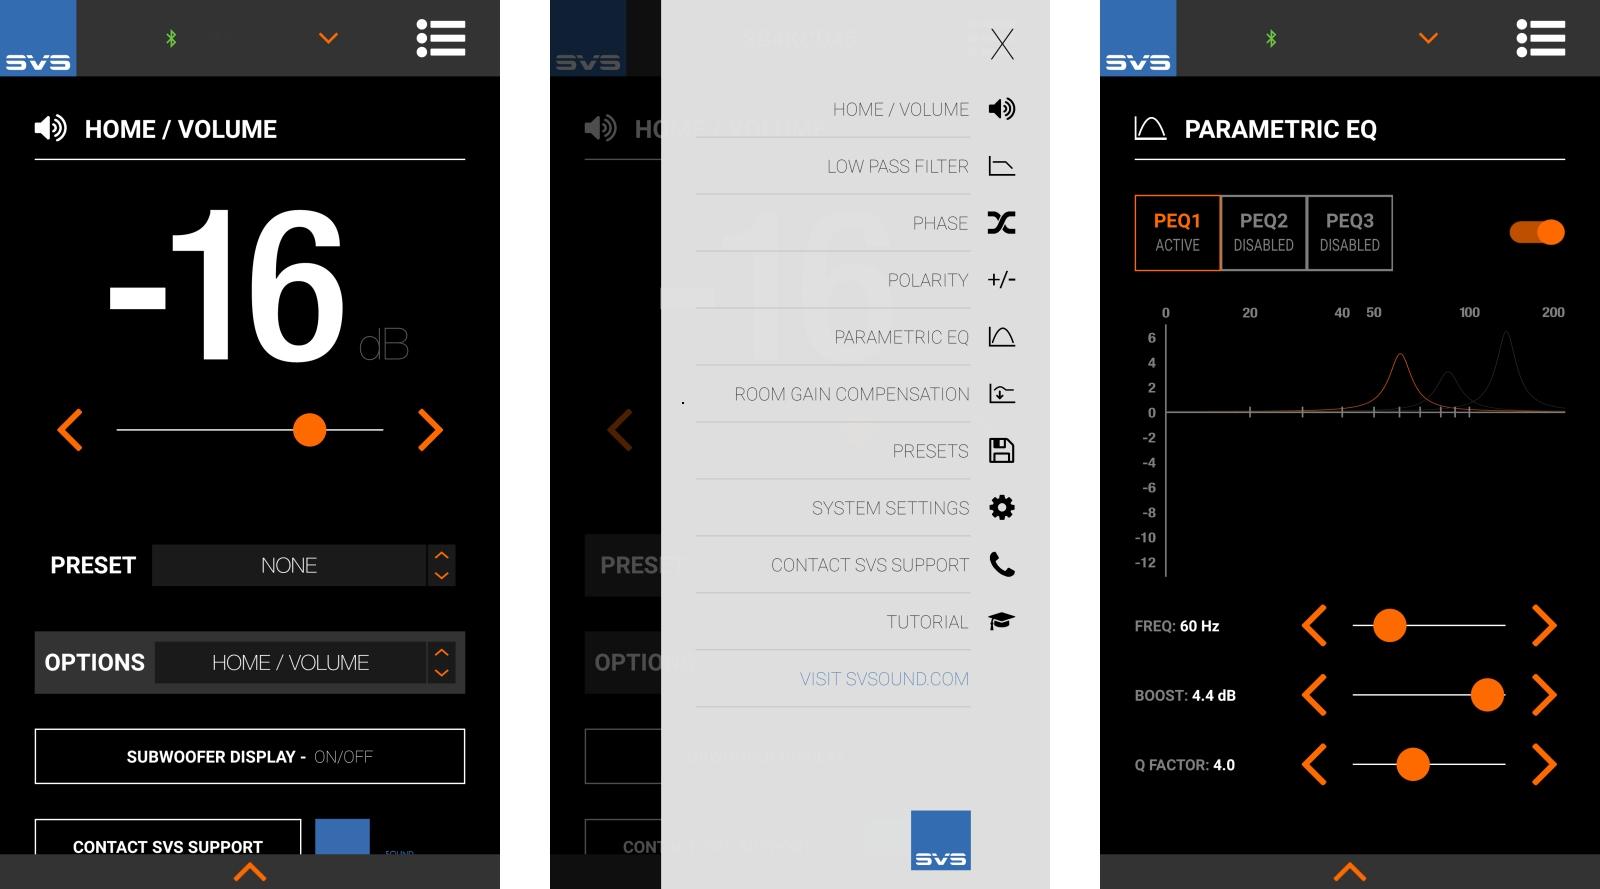 SVS App Screens